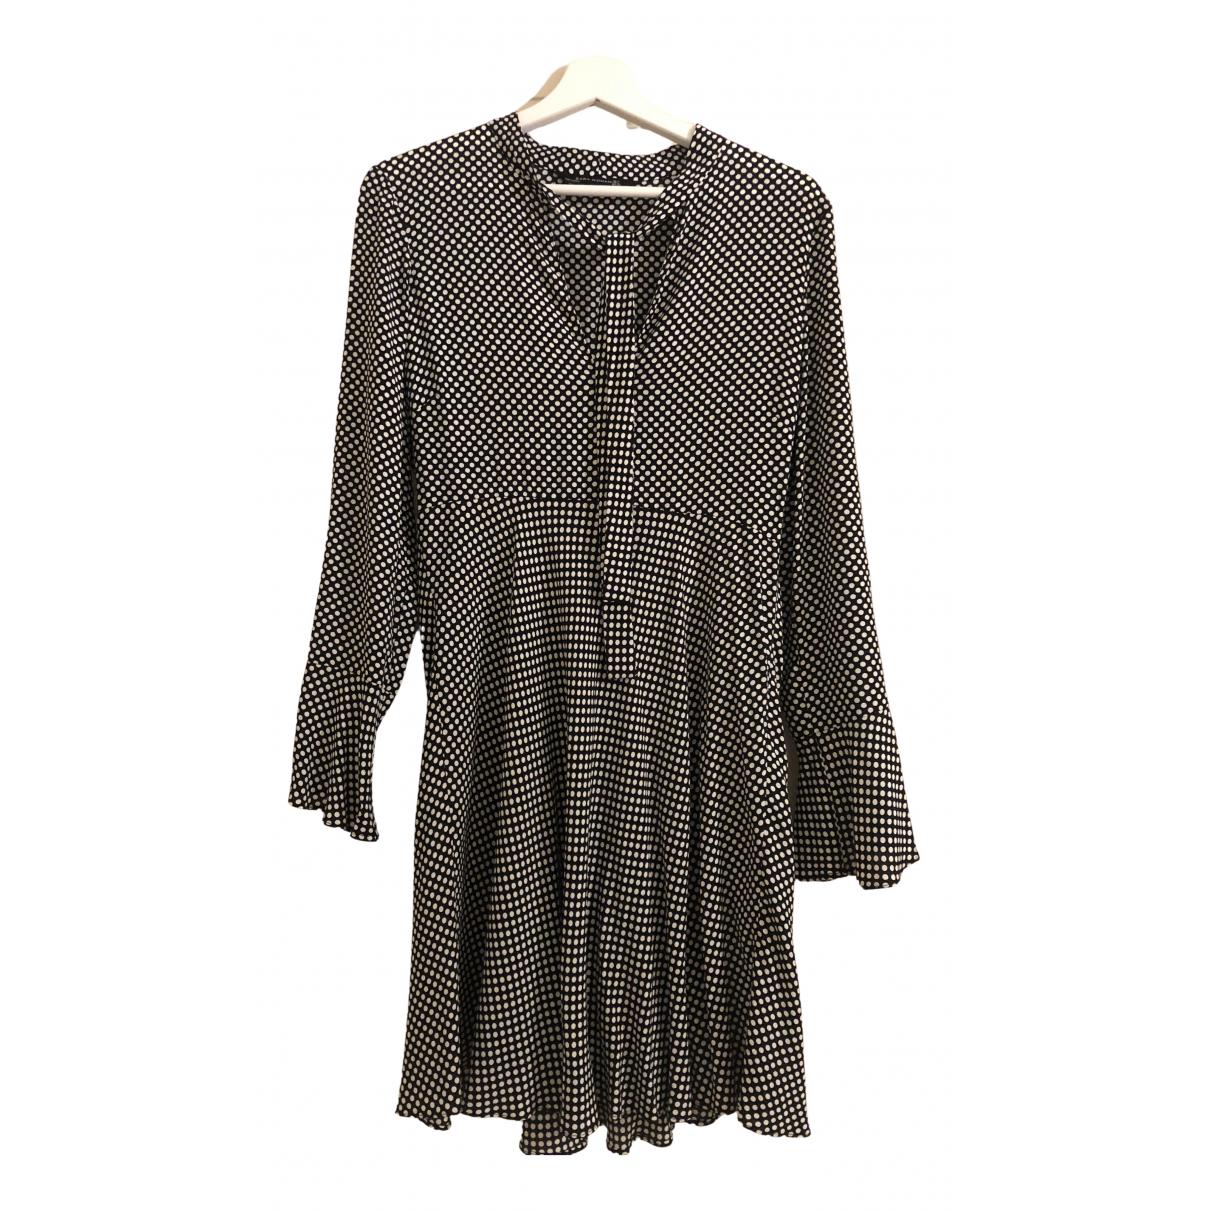 Zara \N Kleid in  Schwarz Viskose